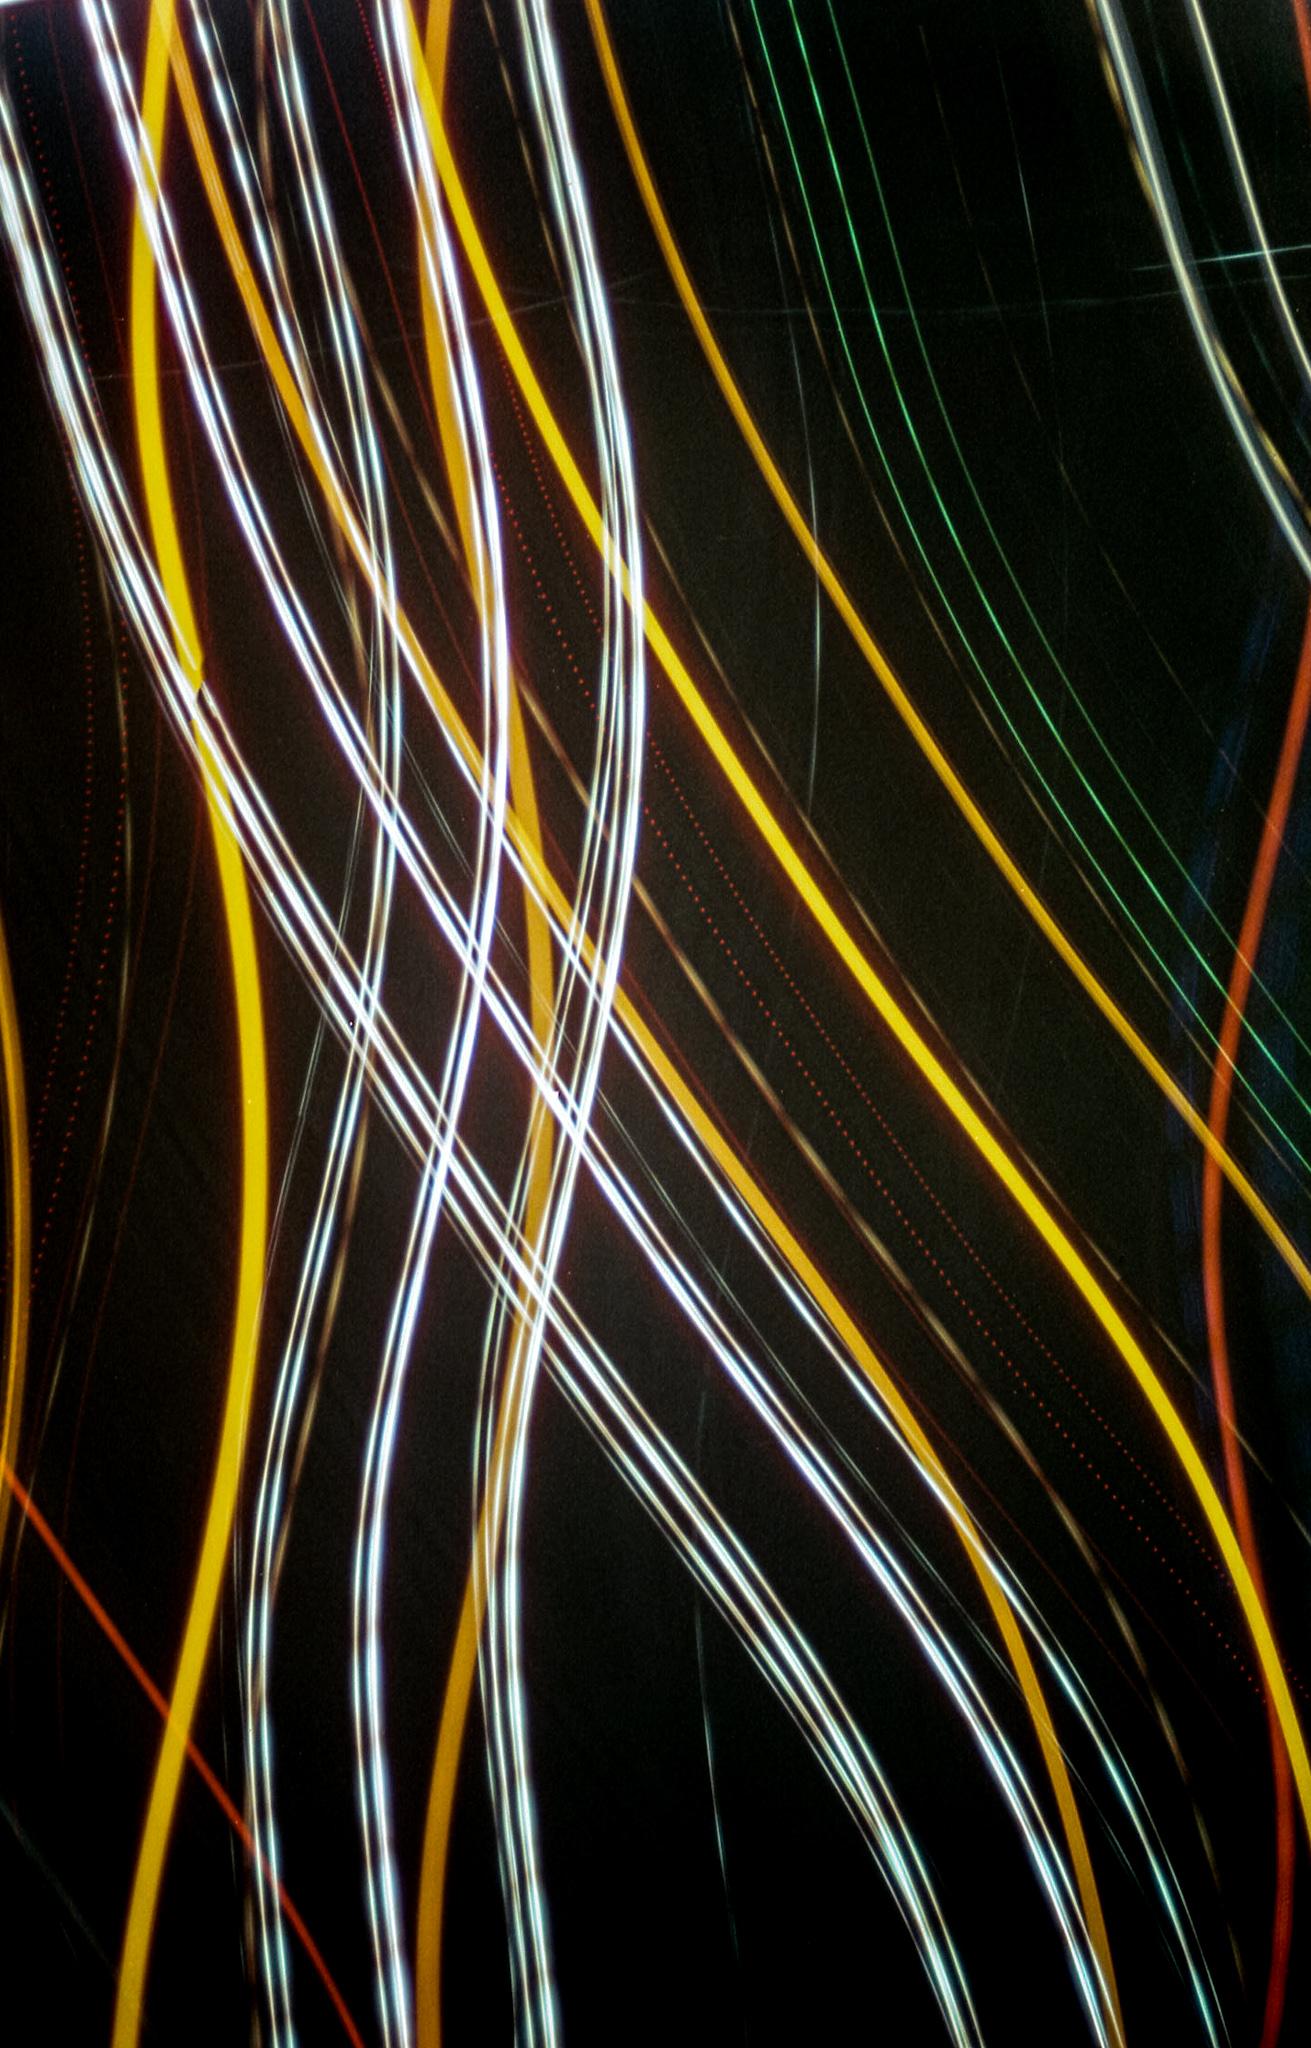 Film Photograph on CineStill 50D. Shot on the Nikon F2